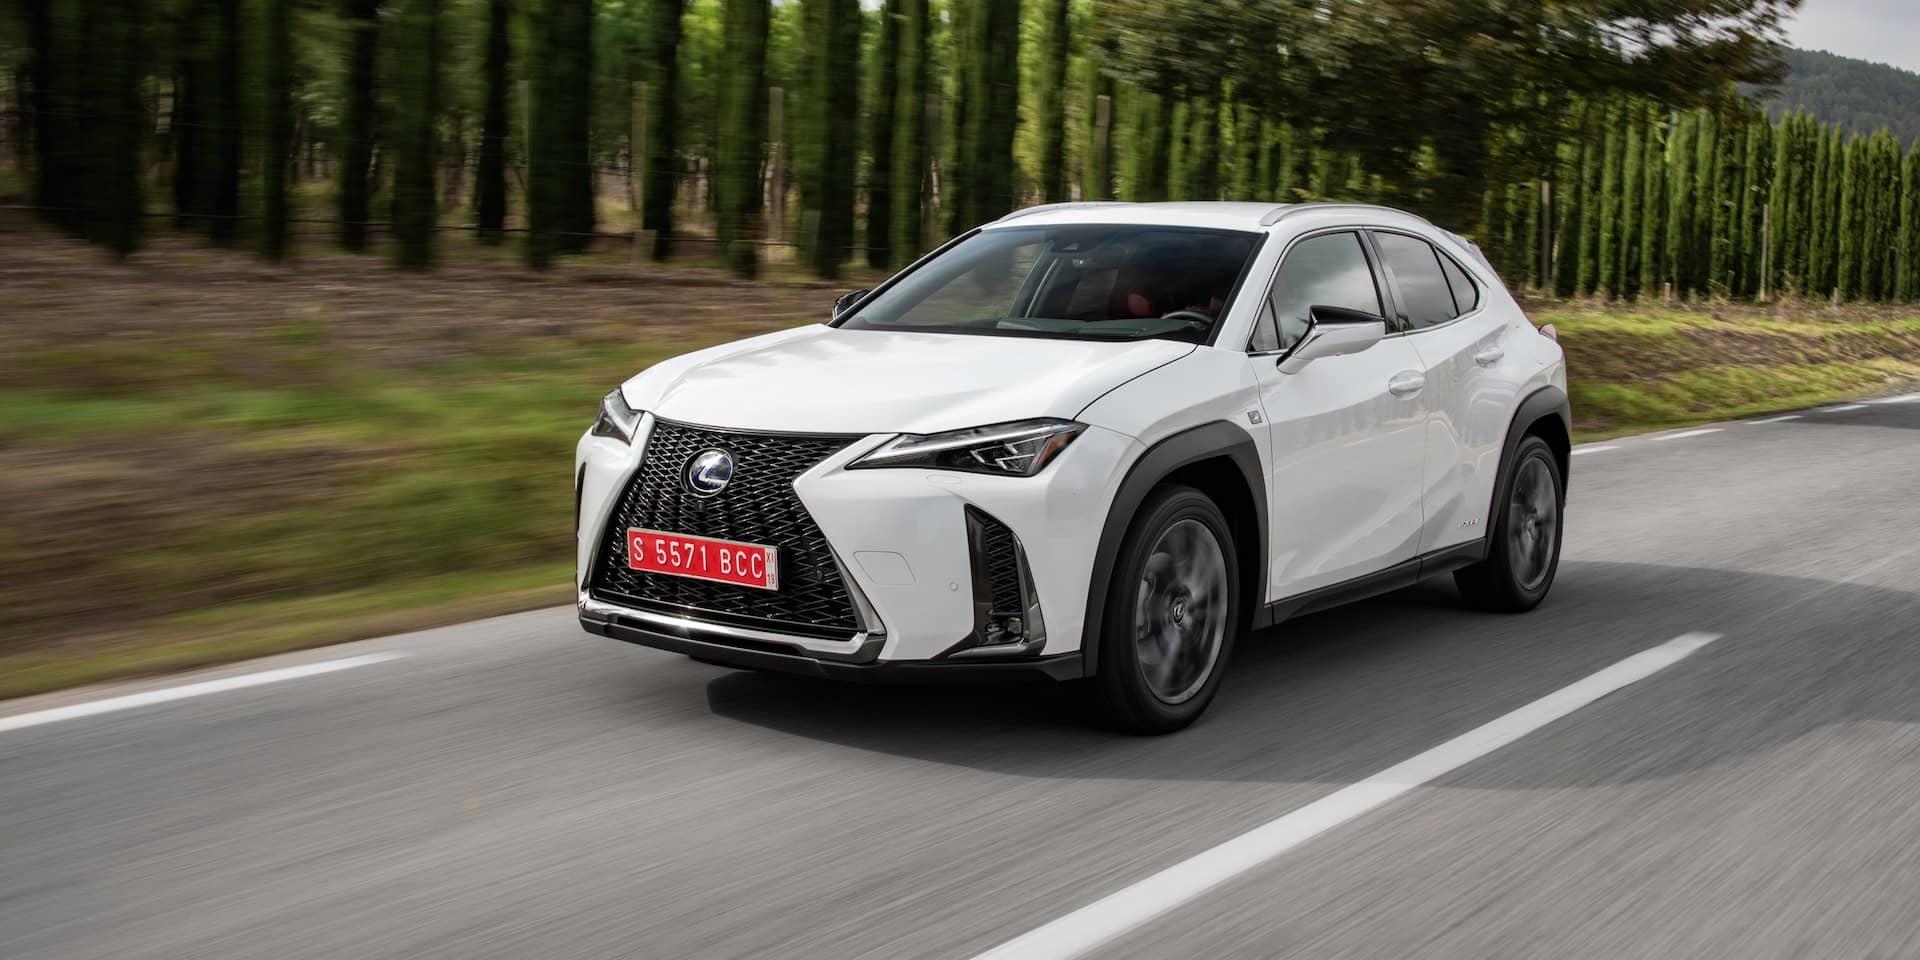 2019 Lexus Ux Test Drive New Car Review The Car Expert